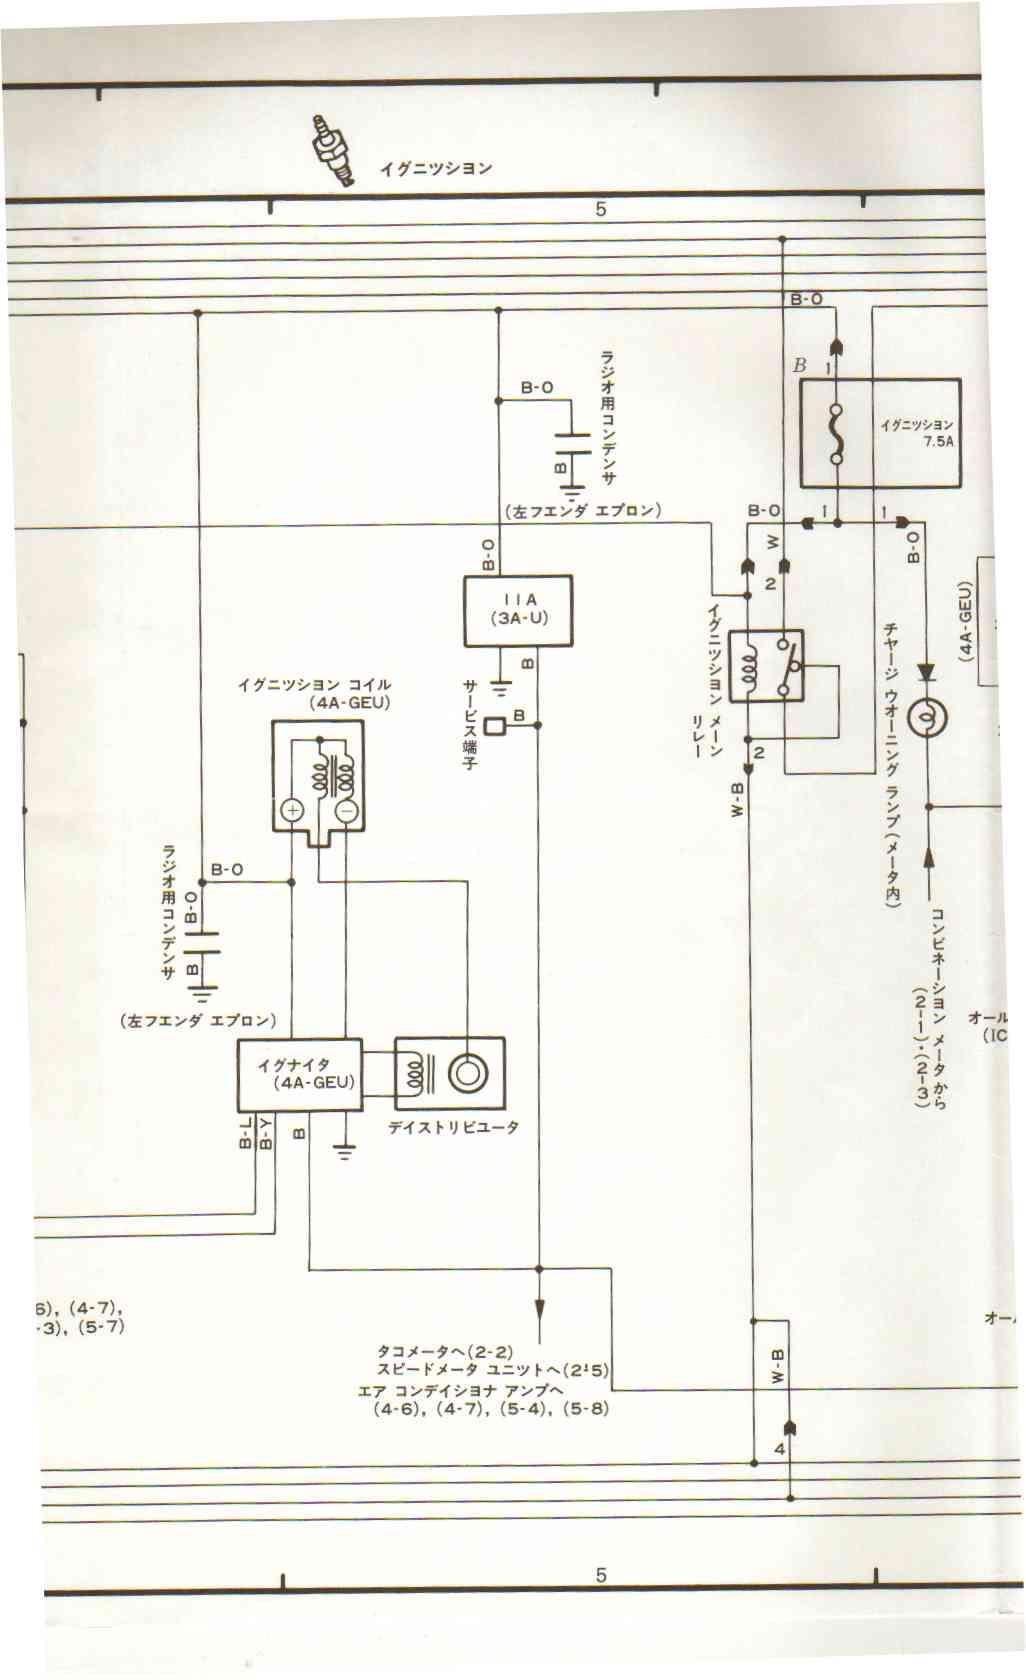 ae86 wiring diagram ga 4906  wiring diagram 1986 toyota corolla gts engine jdm toyota  wiring diagram 1986 toyota corolla gts